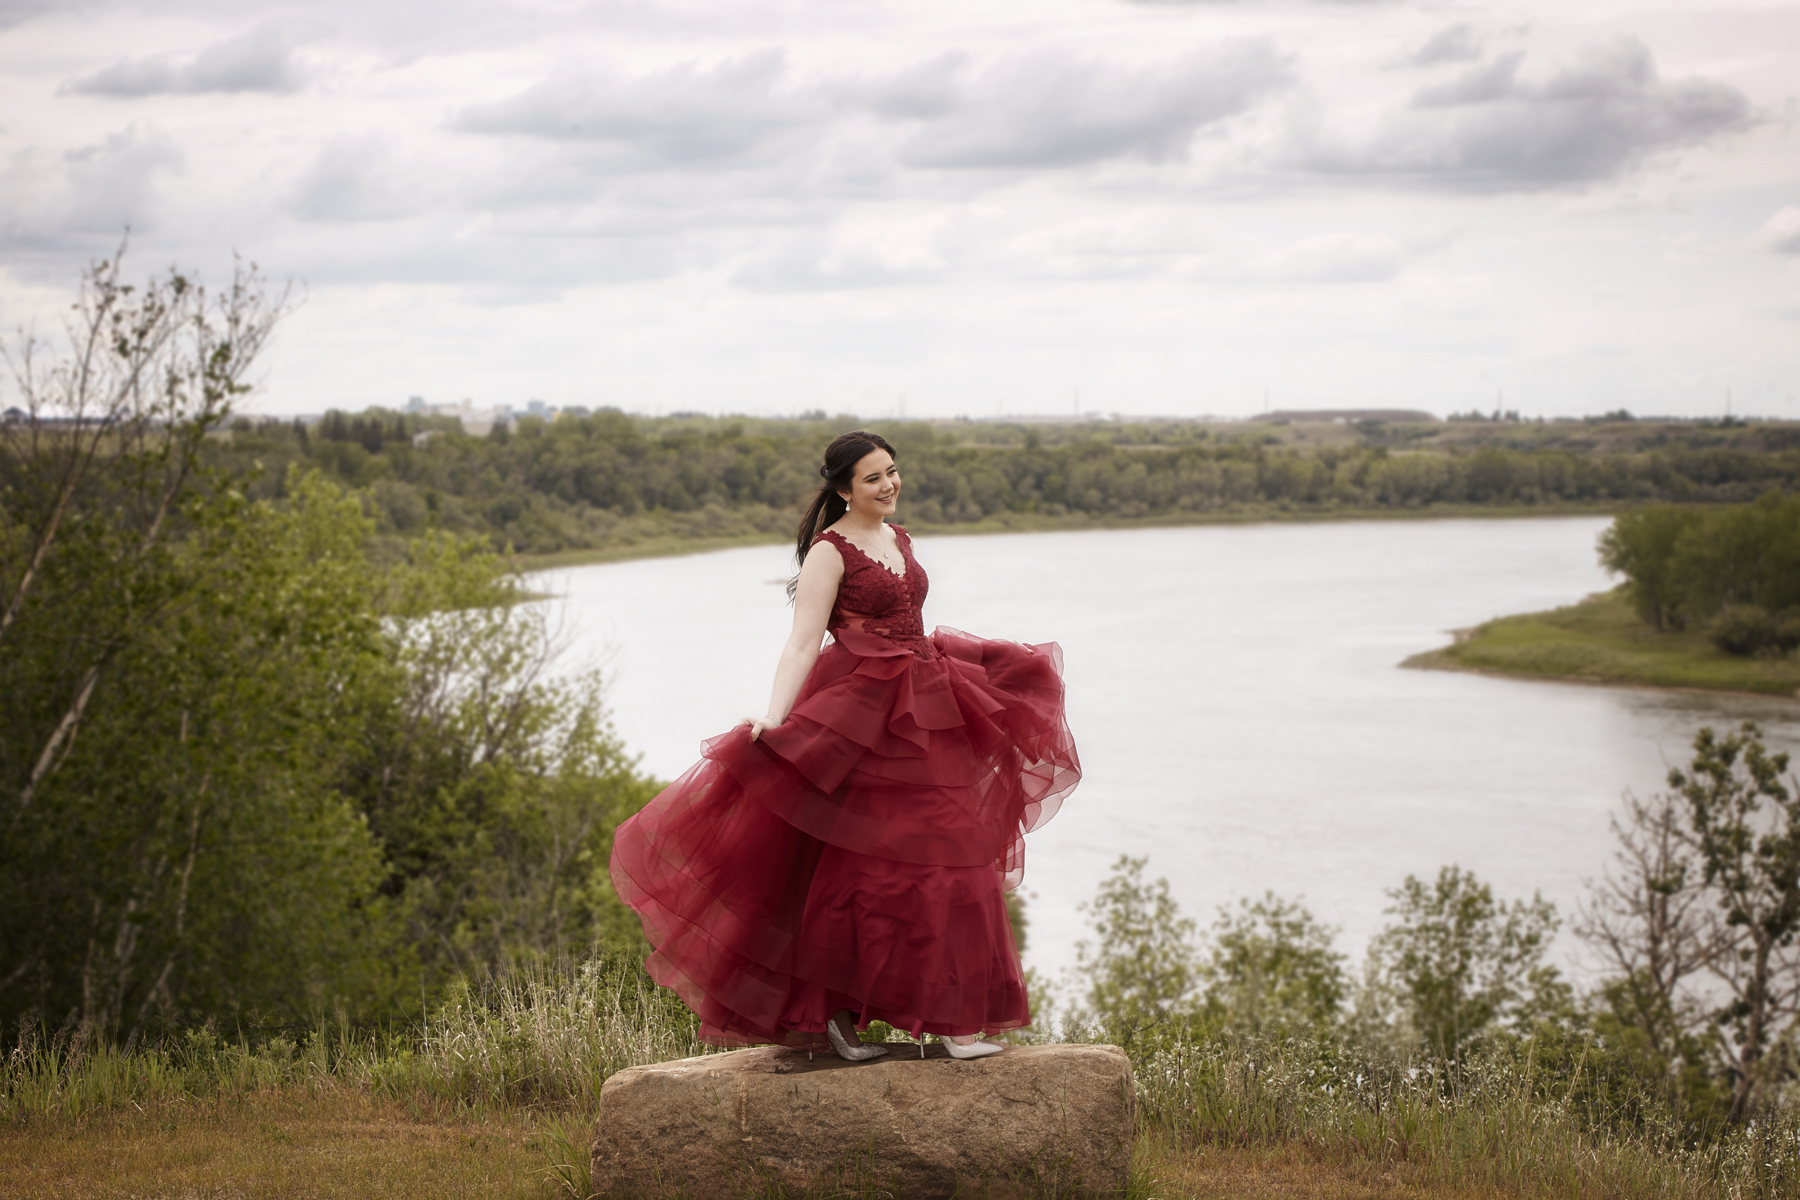 cindy-moleski-professional-grad-senior-graduation-portrait-photographer-saskatoon-saskatchewan-29546-335e.jpg